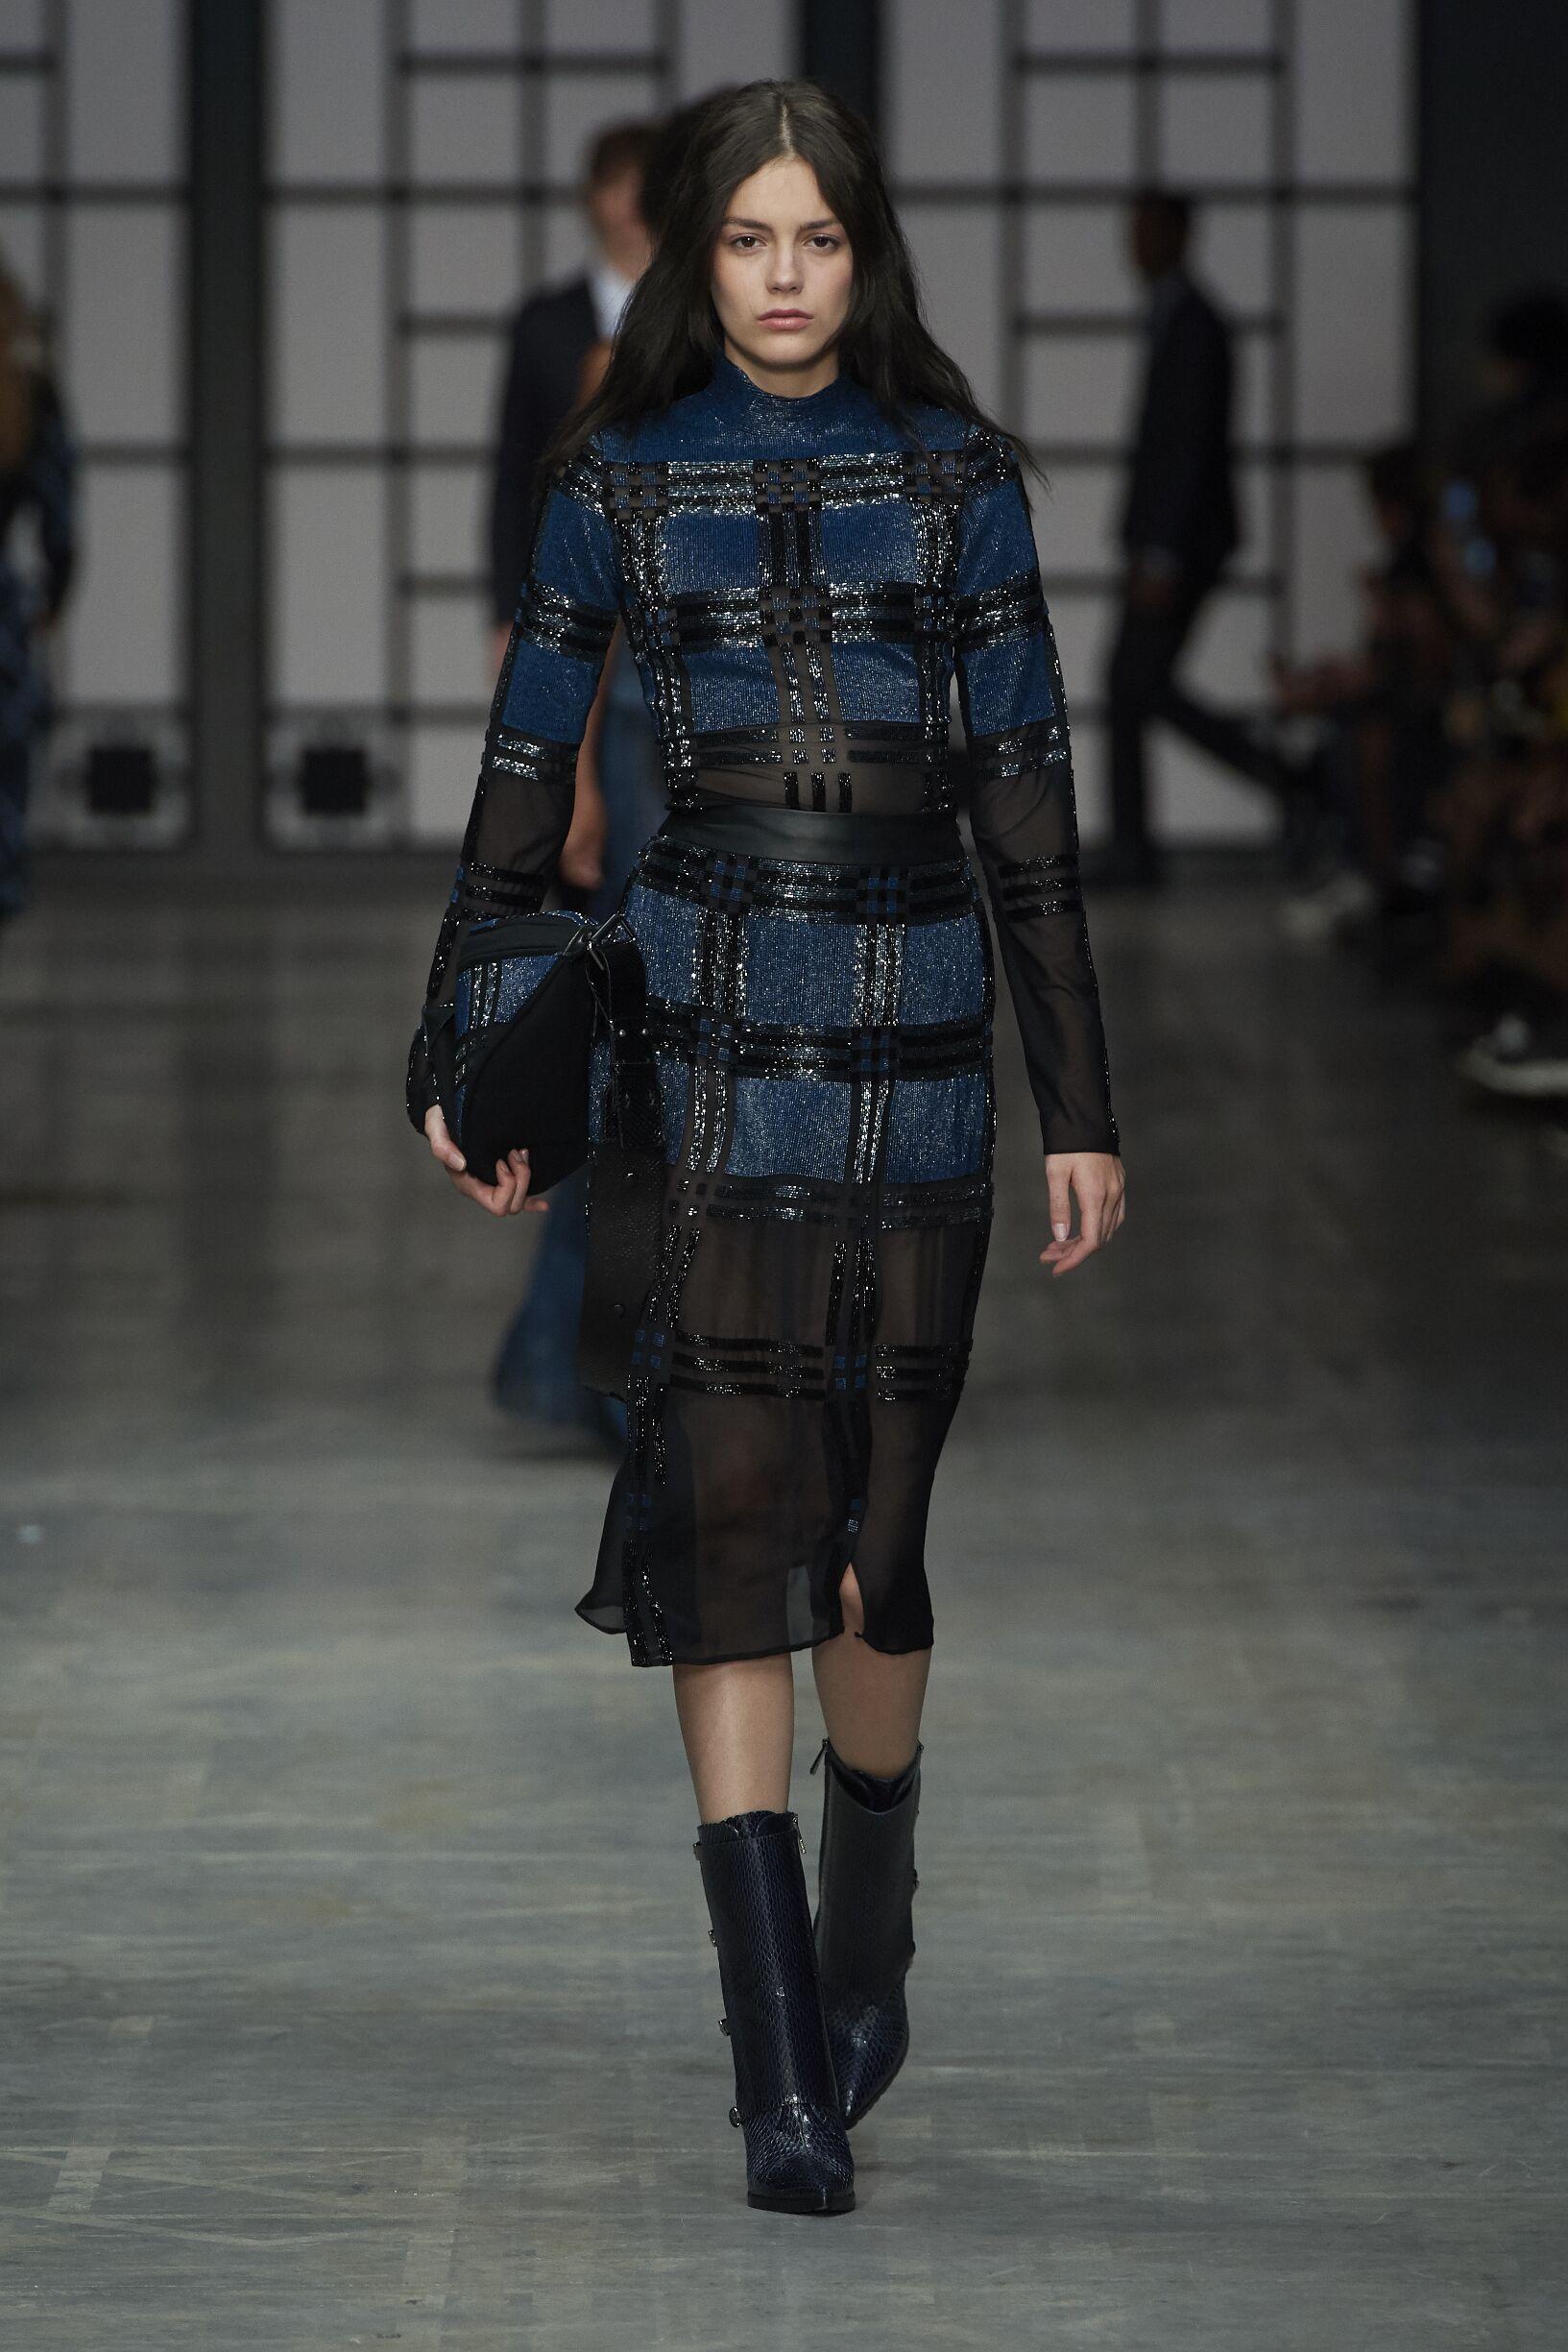 Womenswear Runway Fashion Show Trussardi